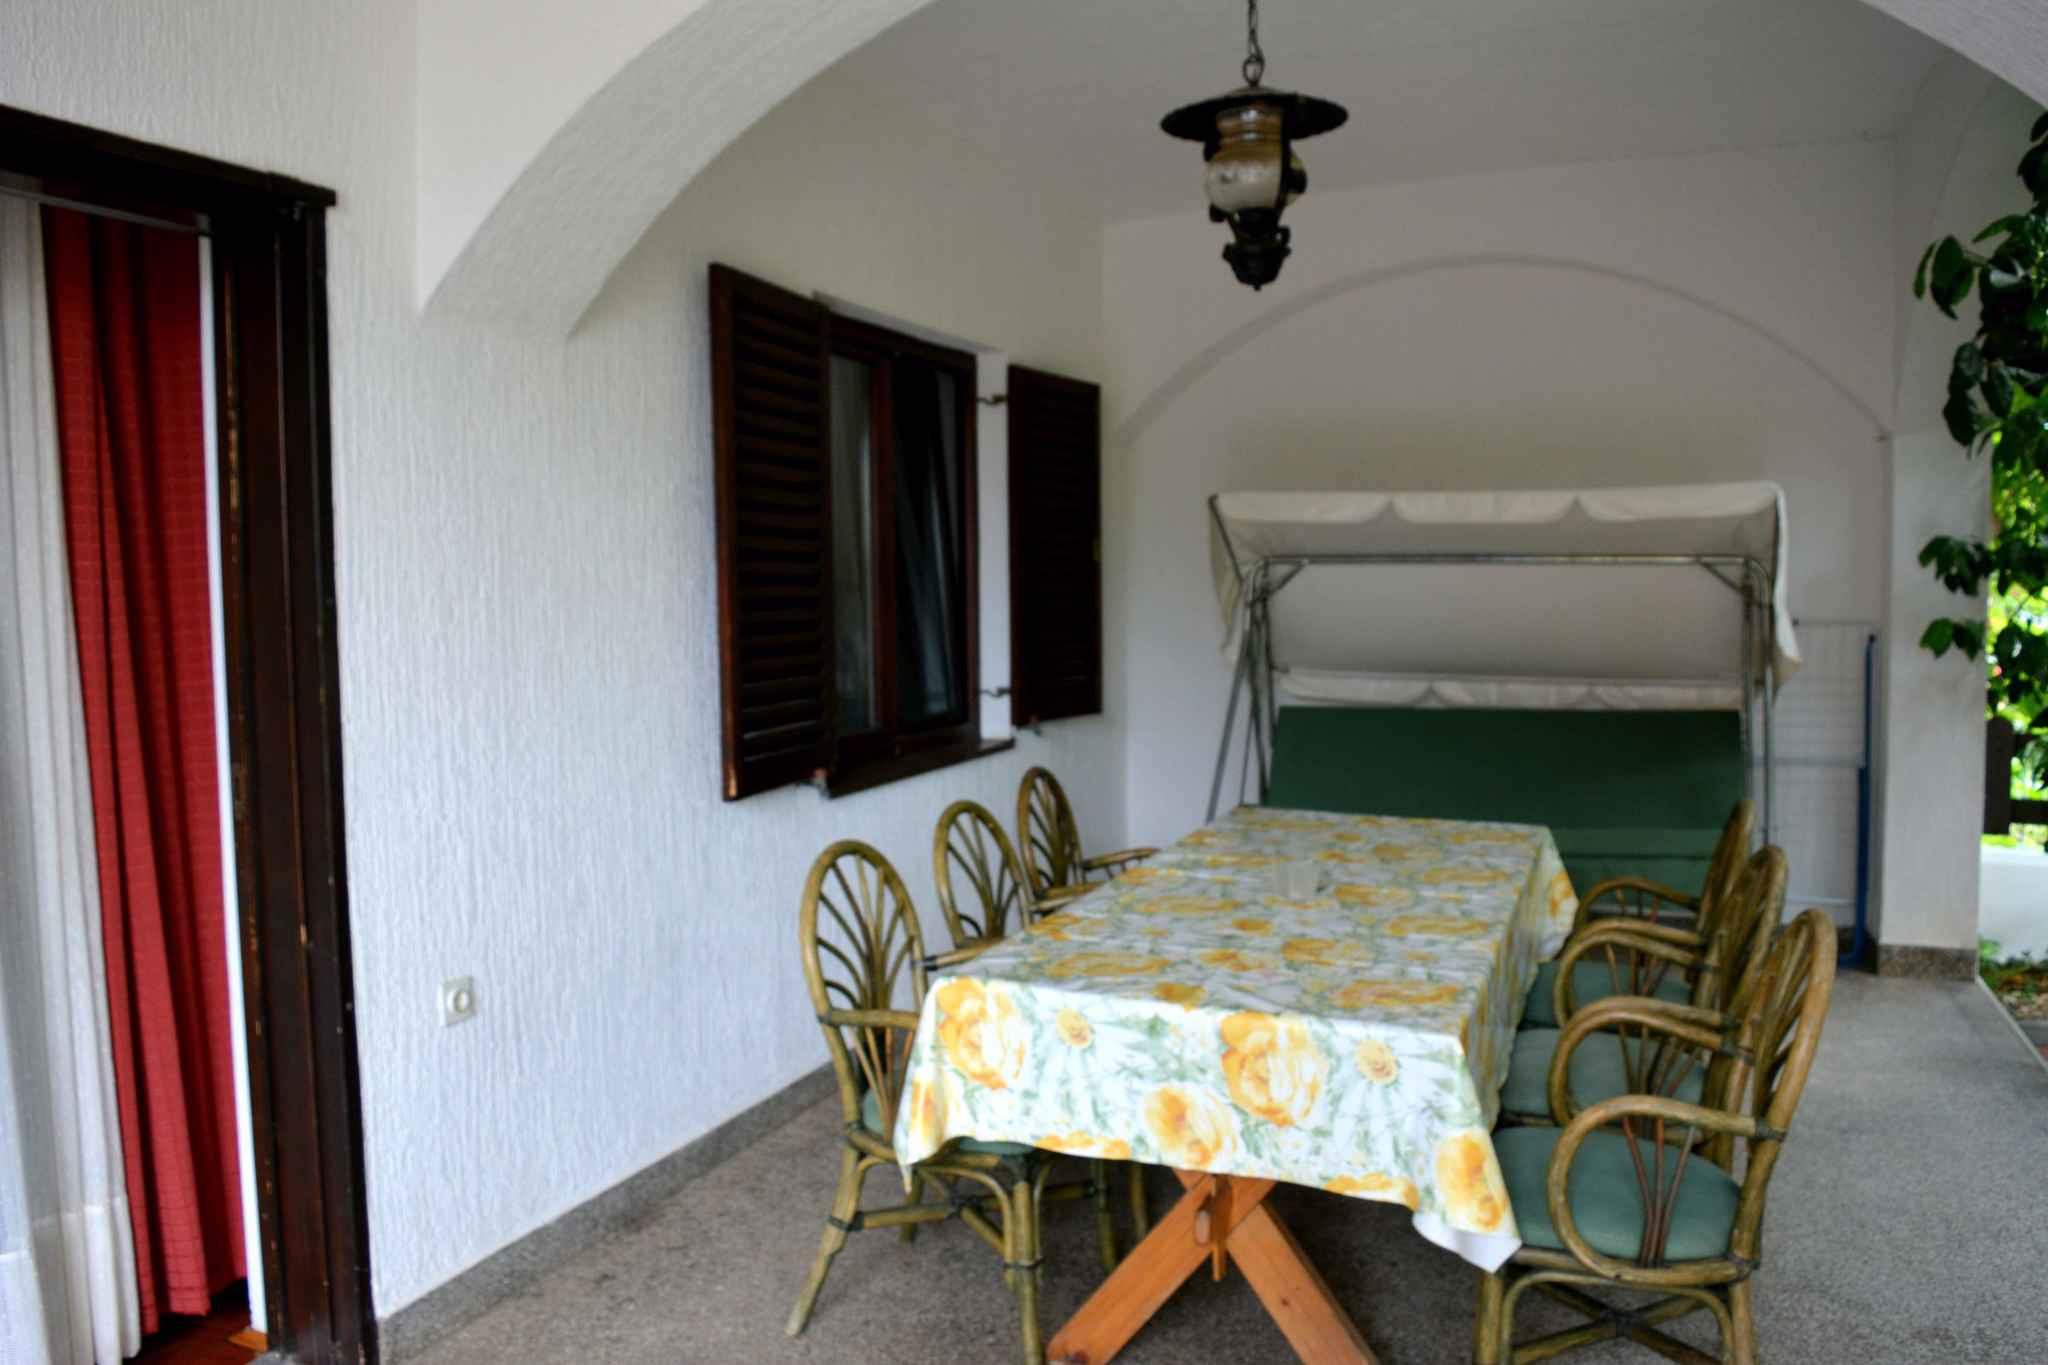 Appartement de vacances mit Terrasse (278776), Vodice, , Dalmatie, Croatie, image 6